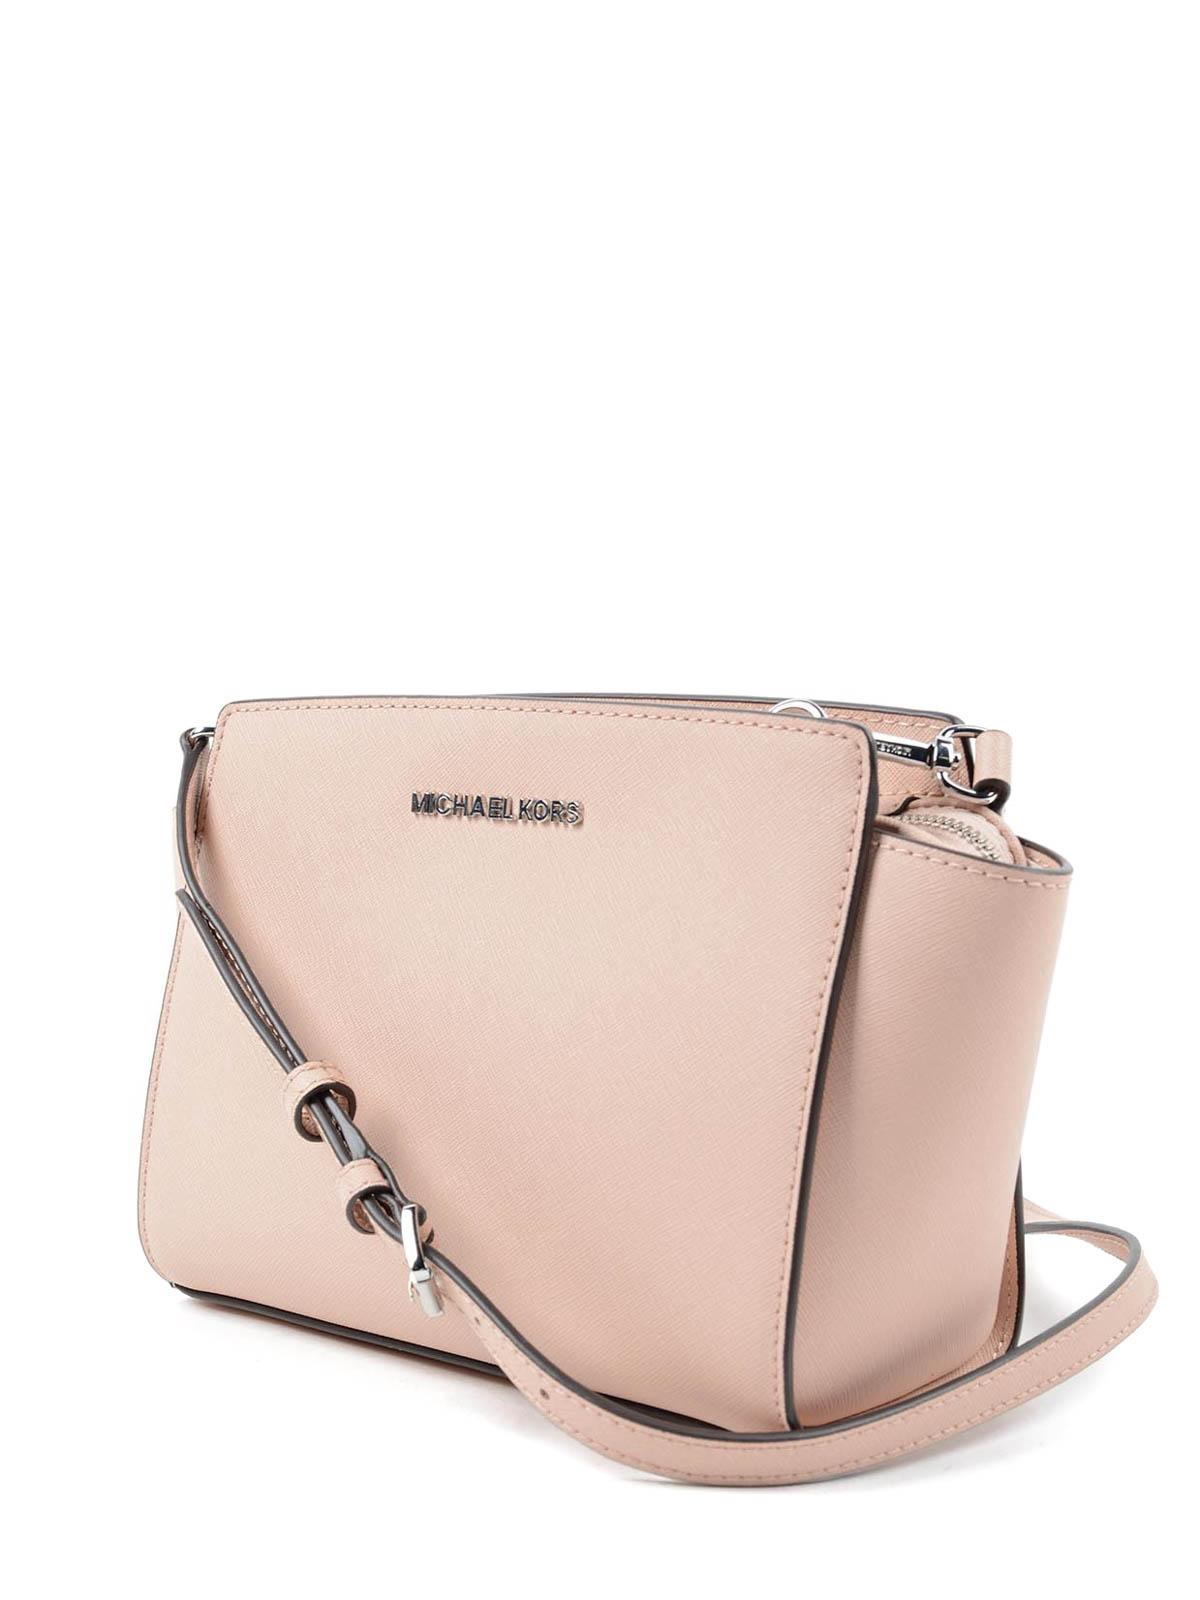 02167a25c783 Michael Kors - Selma medium messenger - cross body bags - 30T3SLMM2L 857